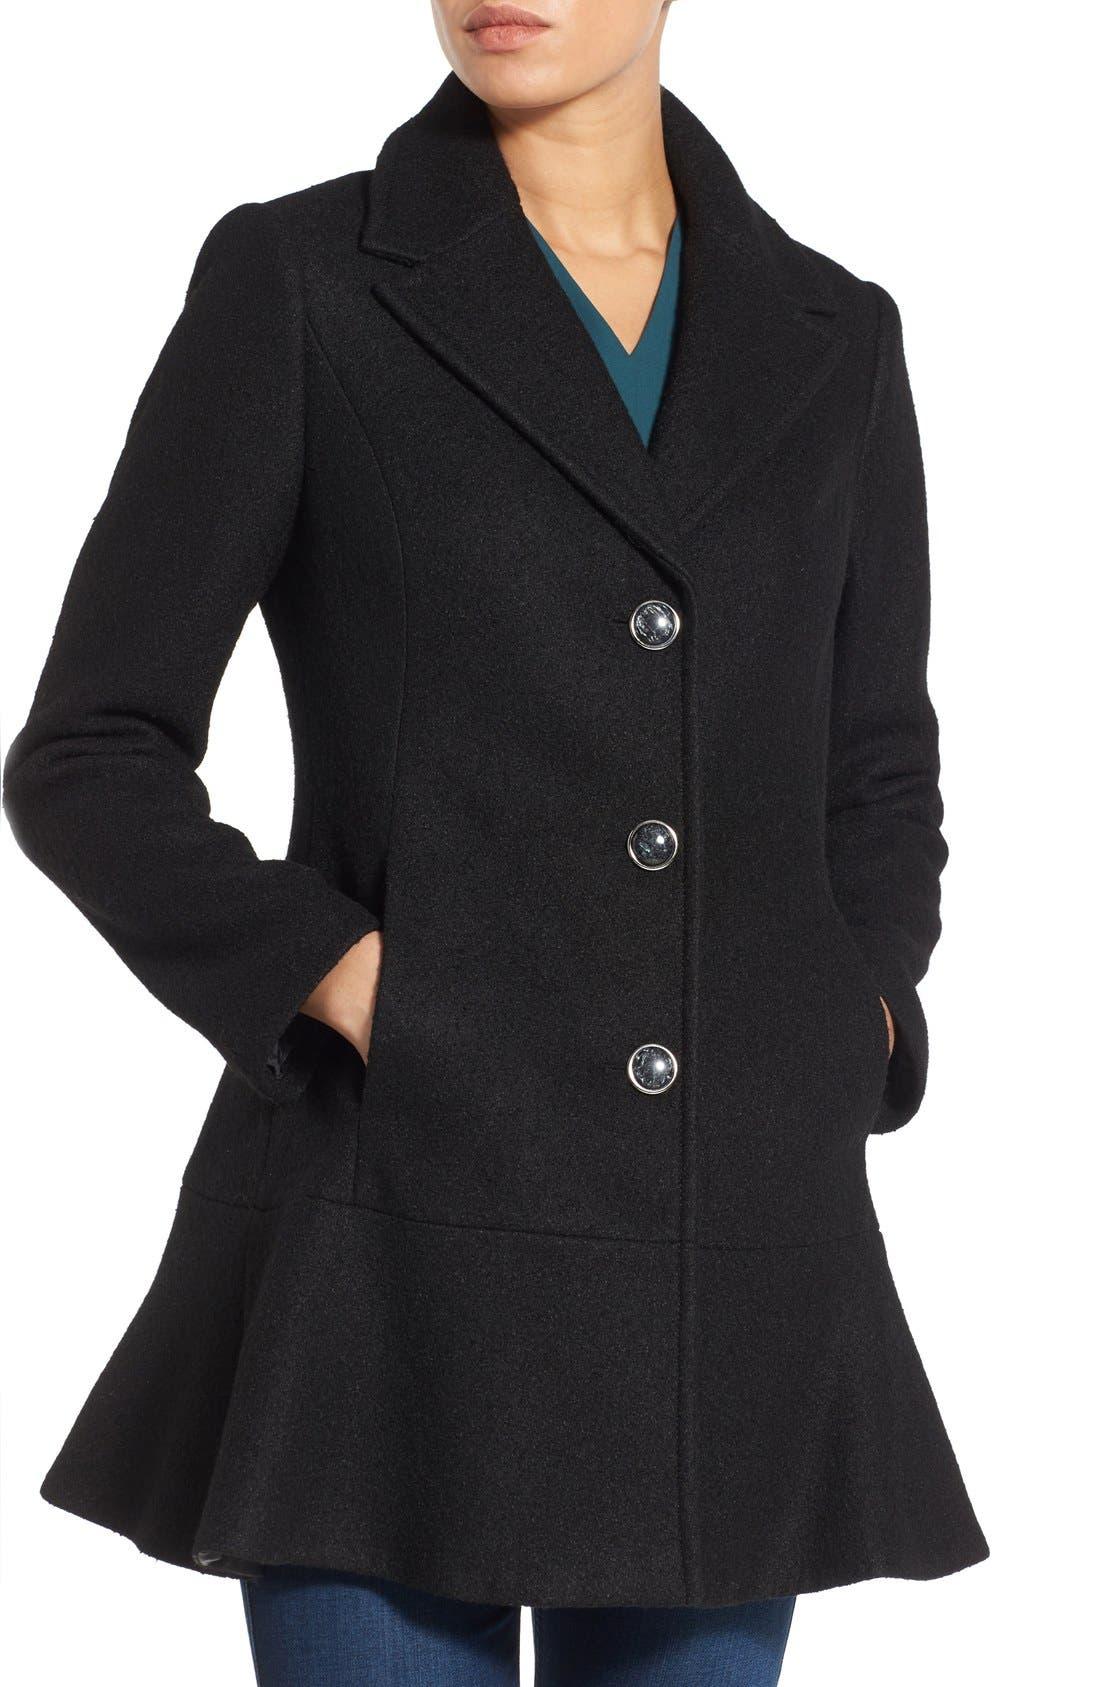 Notch Lapel Peplum Coat,                         Main,                         color, Black